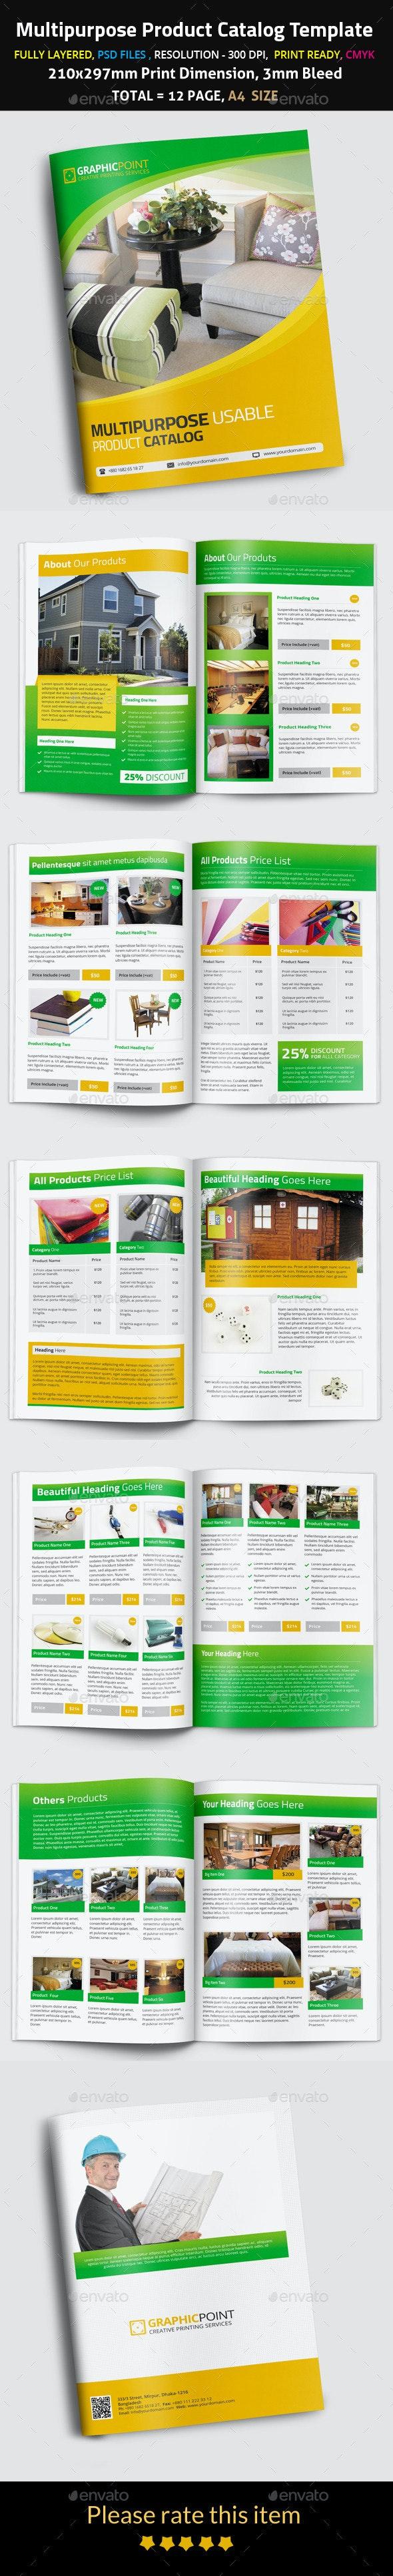 Multipurpose Product Catalog Template - Brochures Print Templates